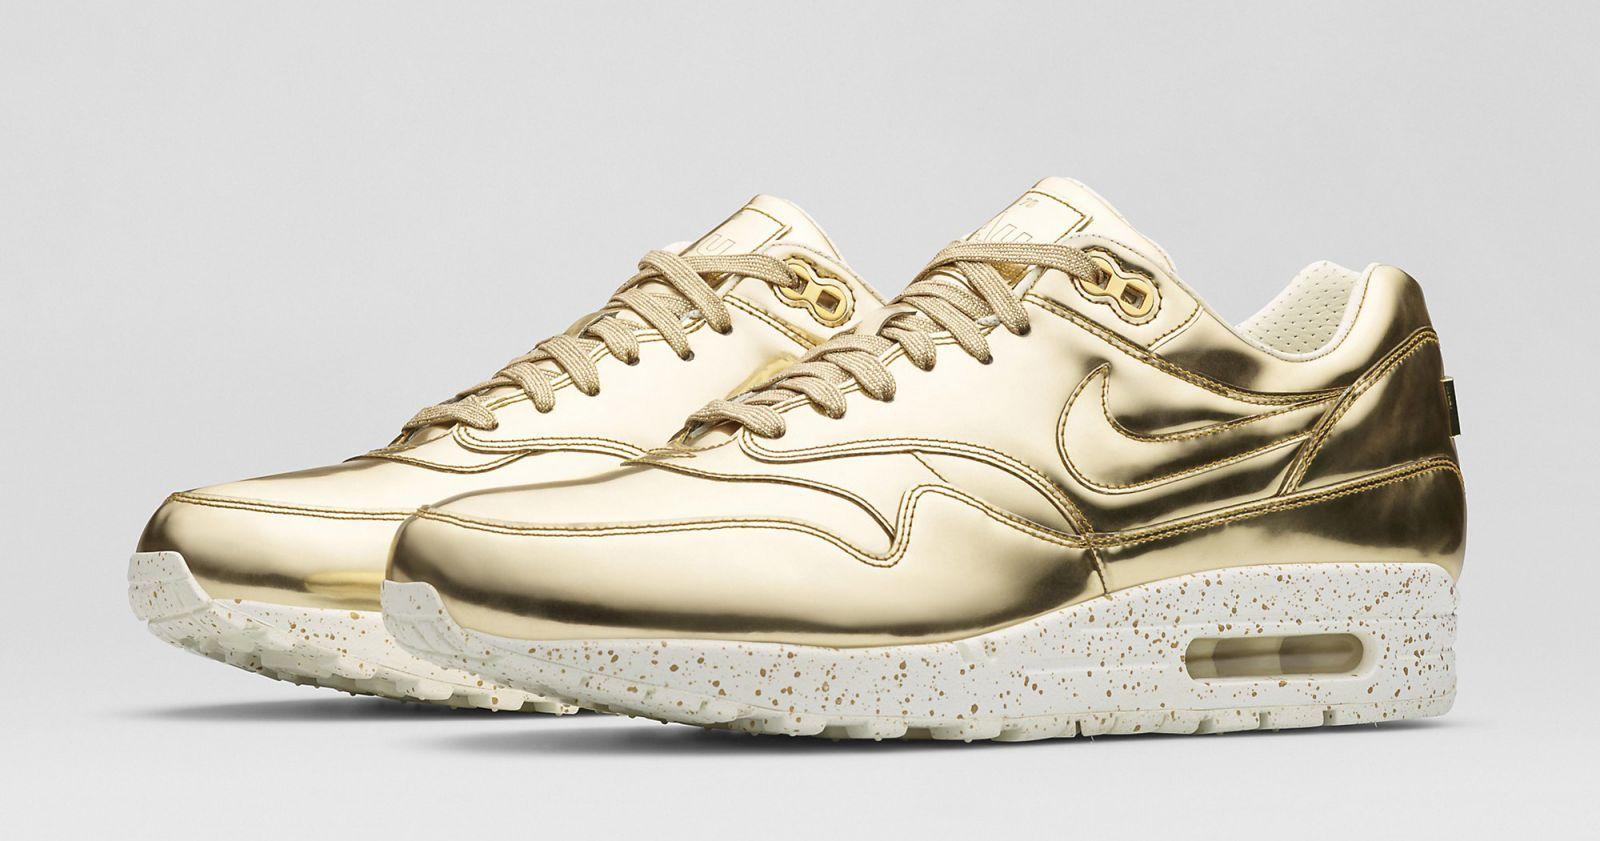 Nike Air Max 1 Liquid Gold Silver | Sole Collector